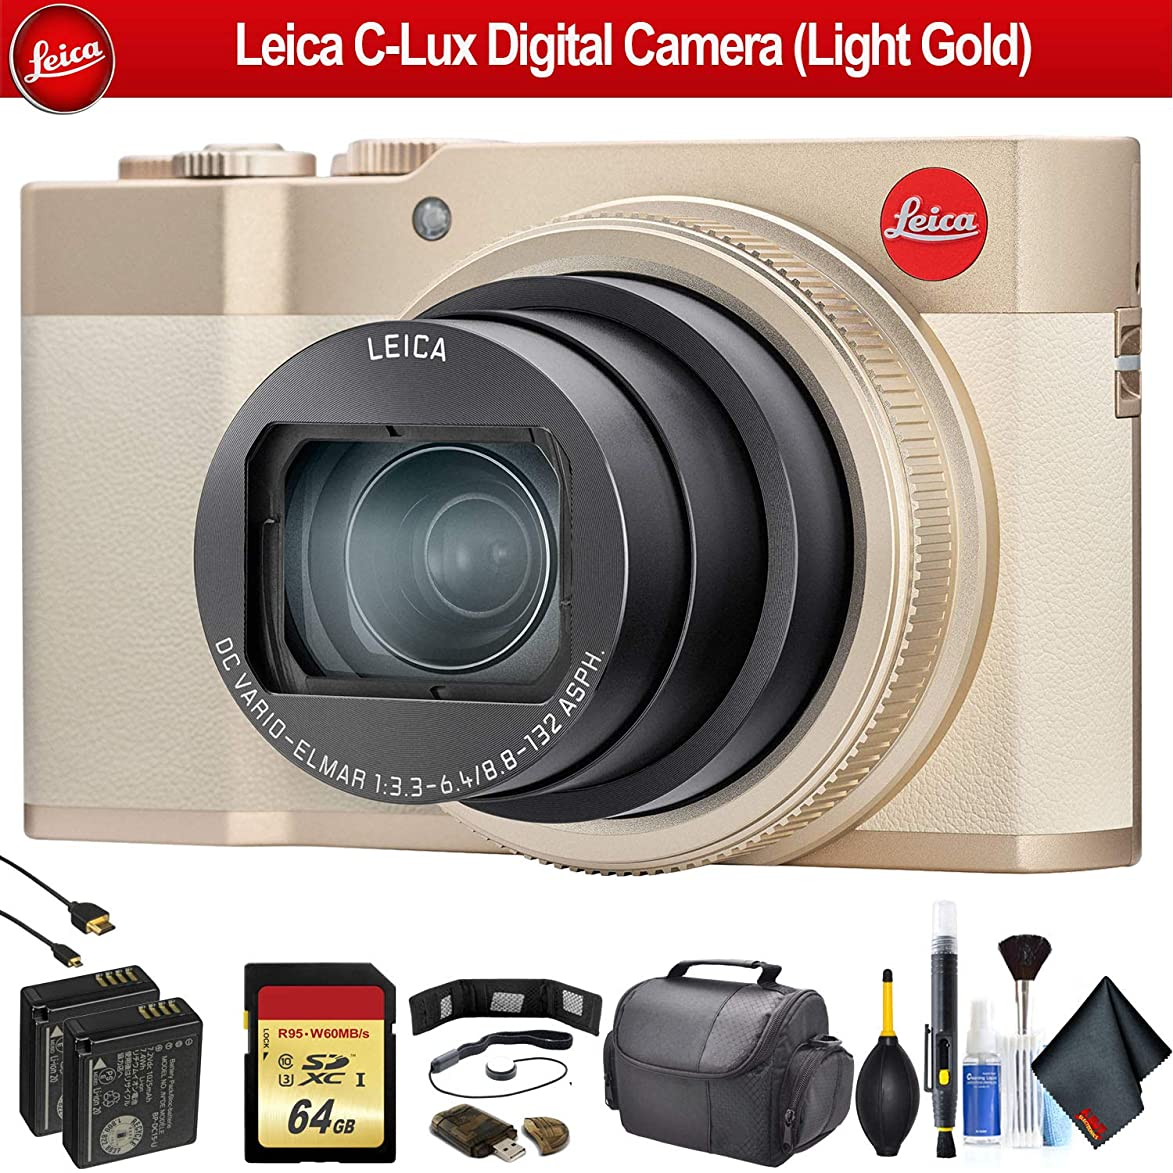 Leica C-Lux Digital Camera (Light Gold) 19126 - Advanced Bundle